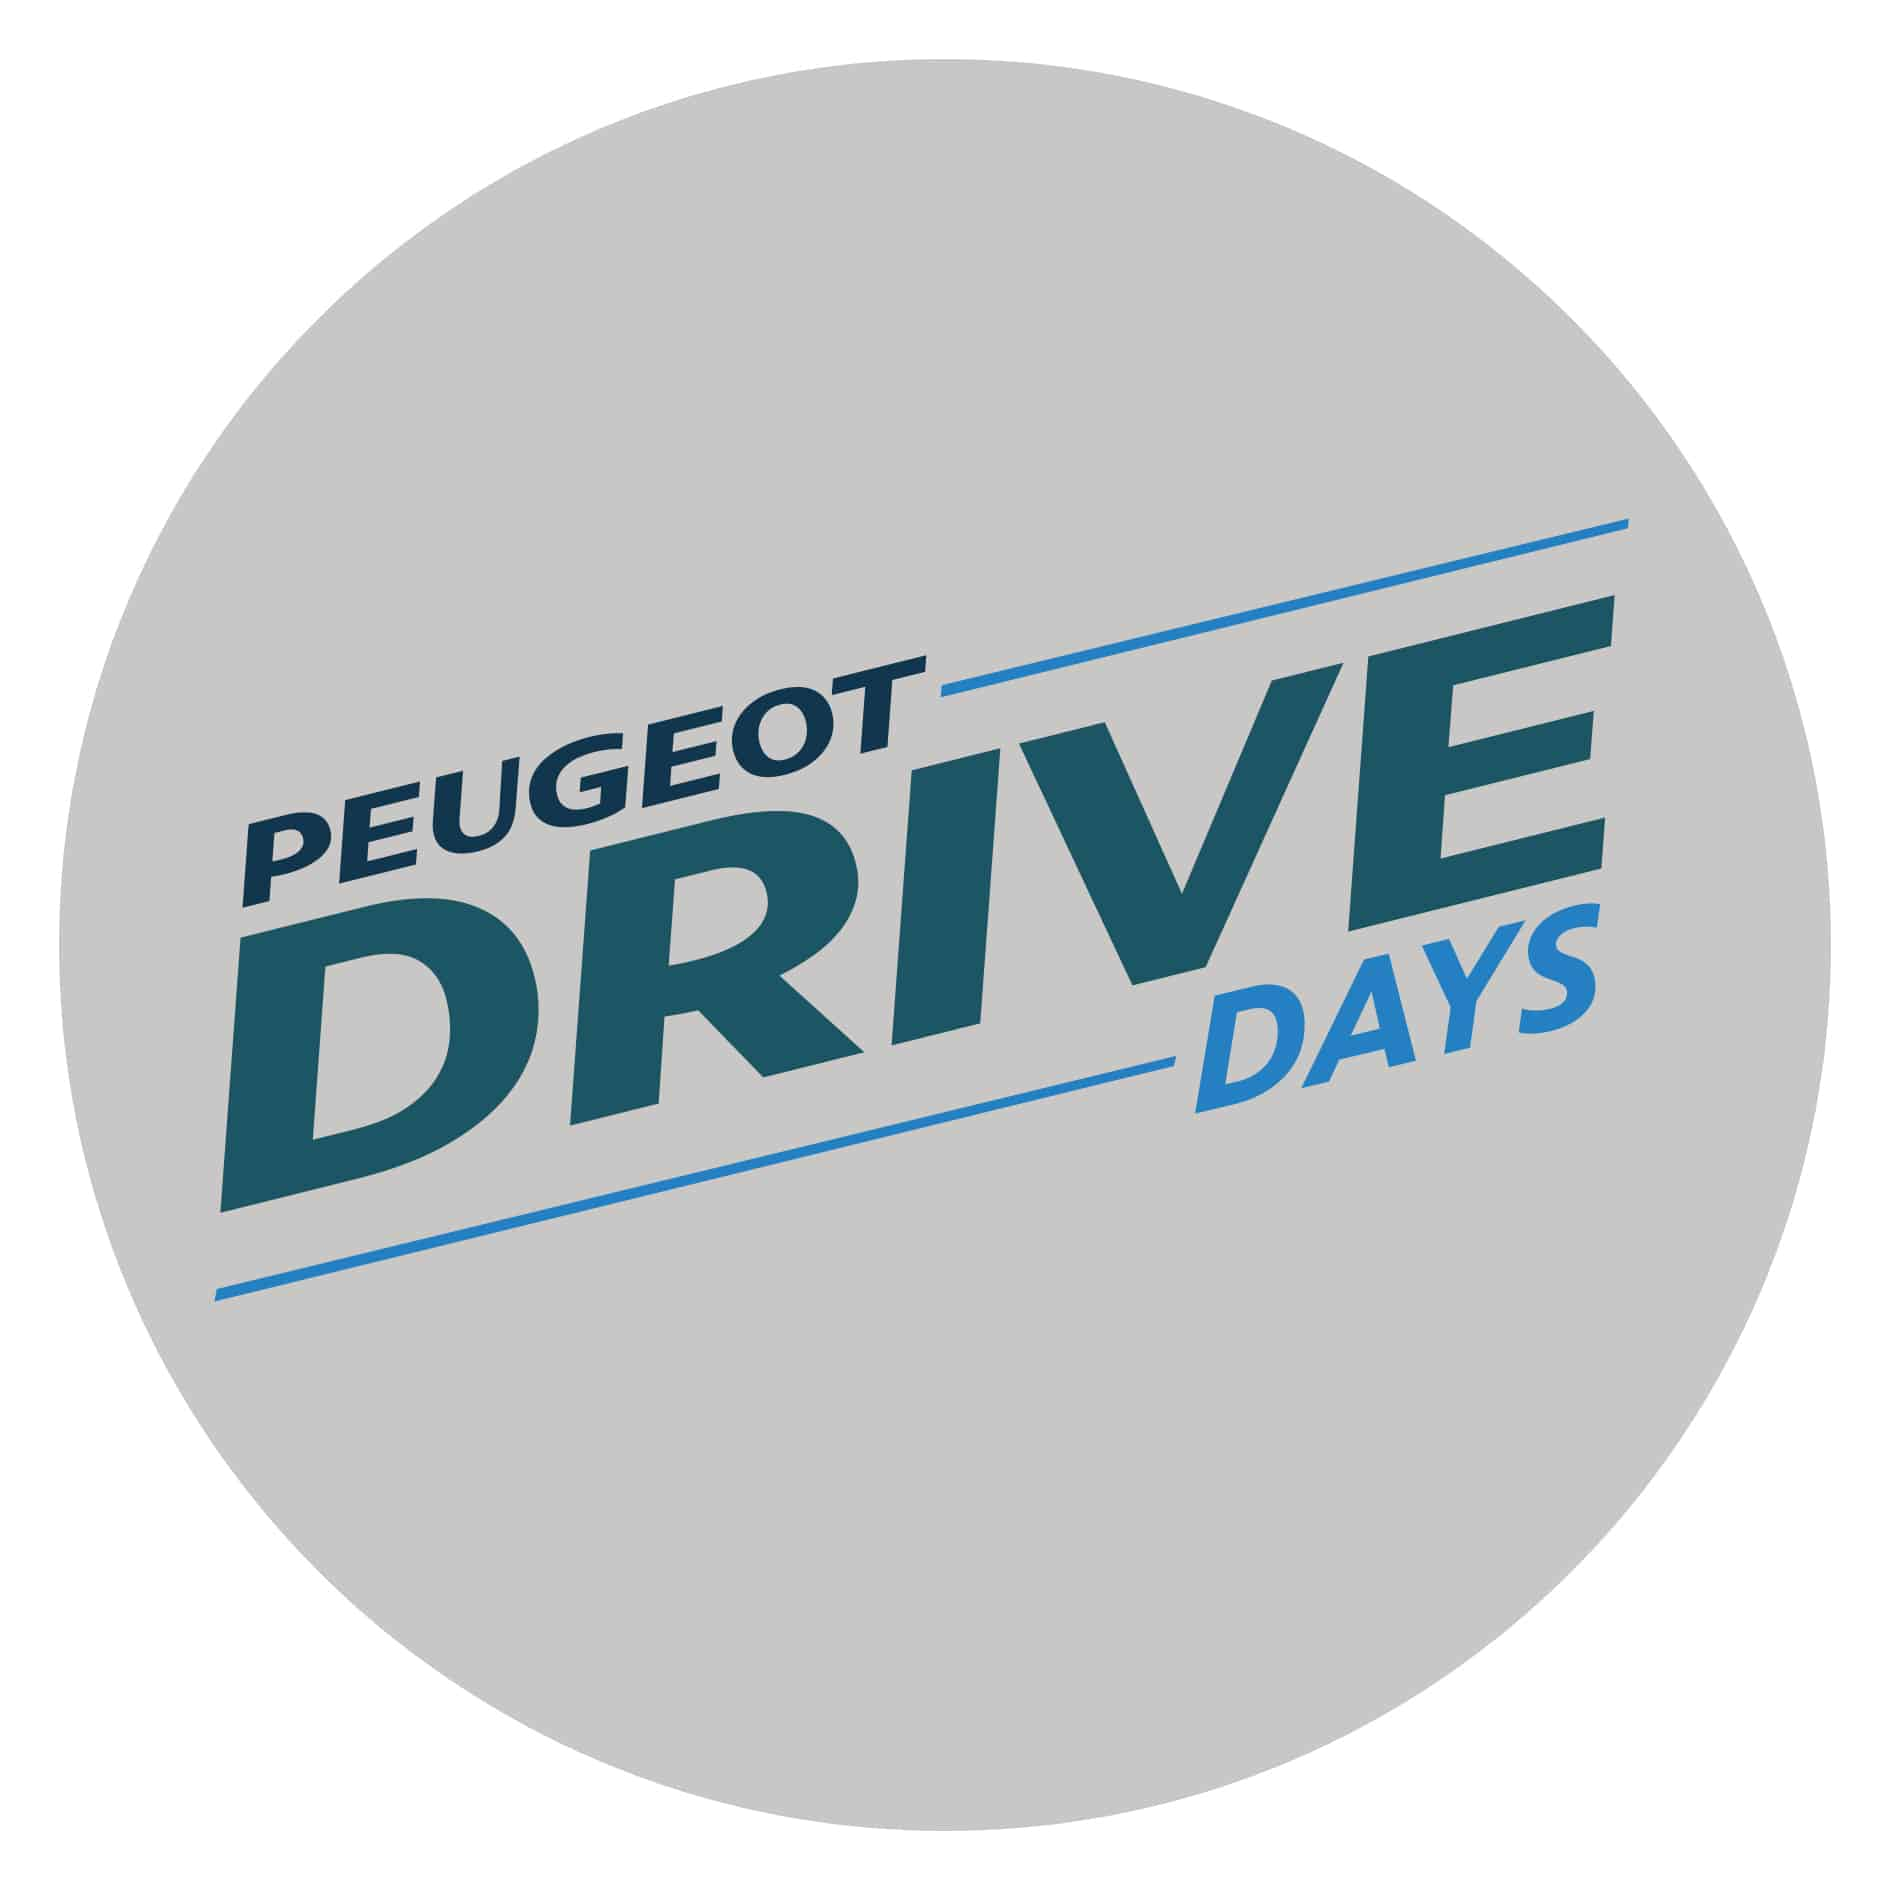 peugeot drive days